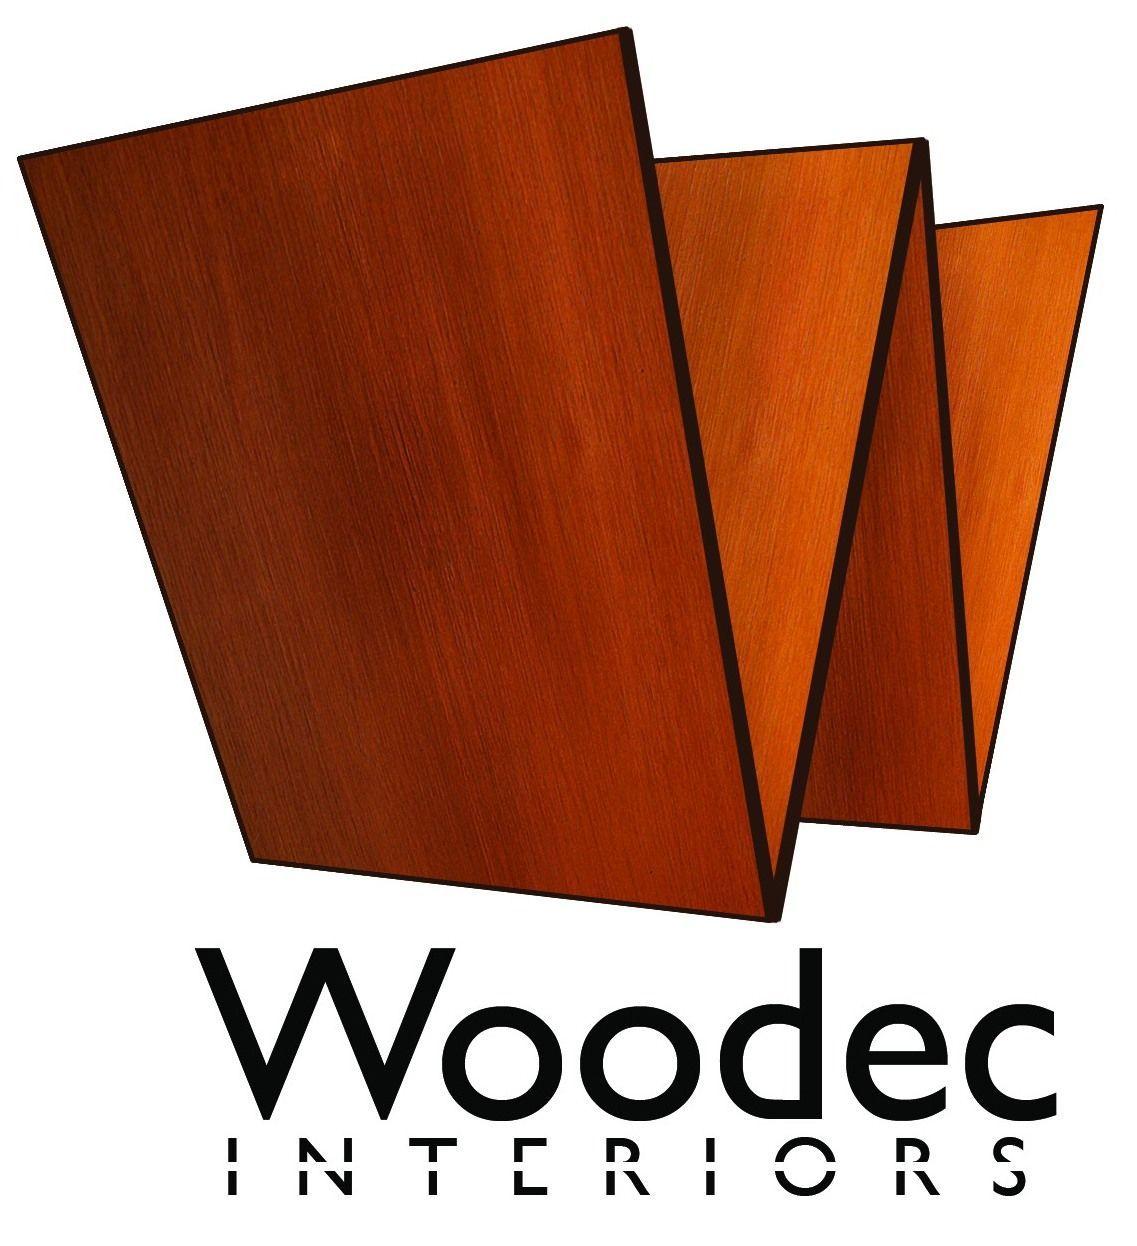 WOODEC INTERIORS